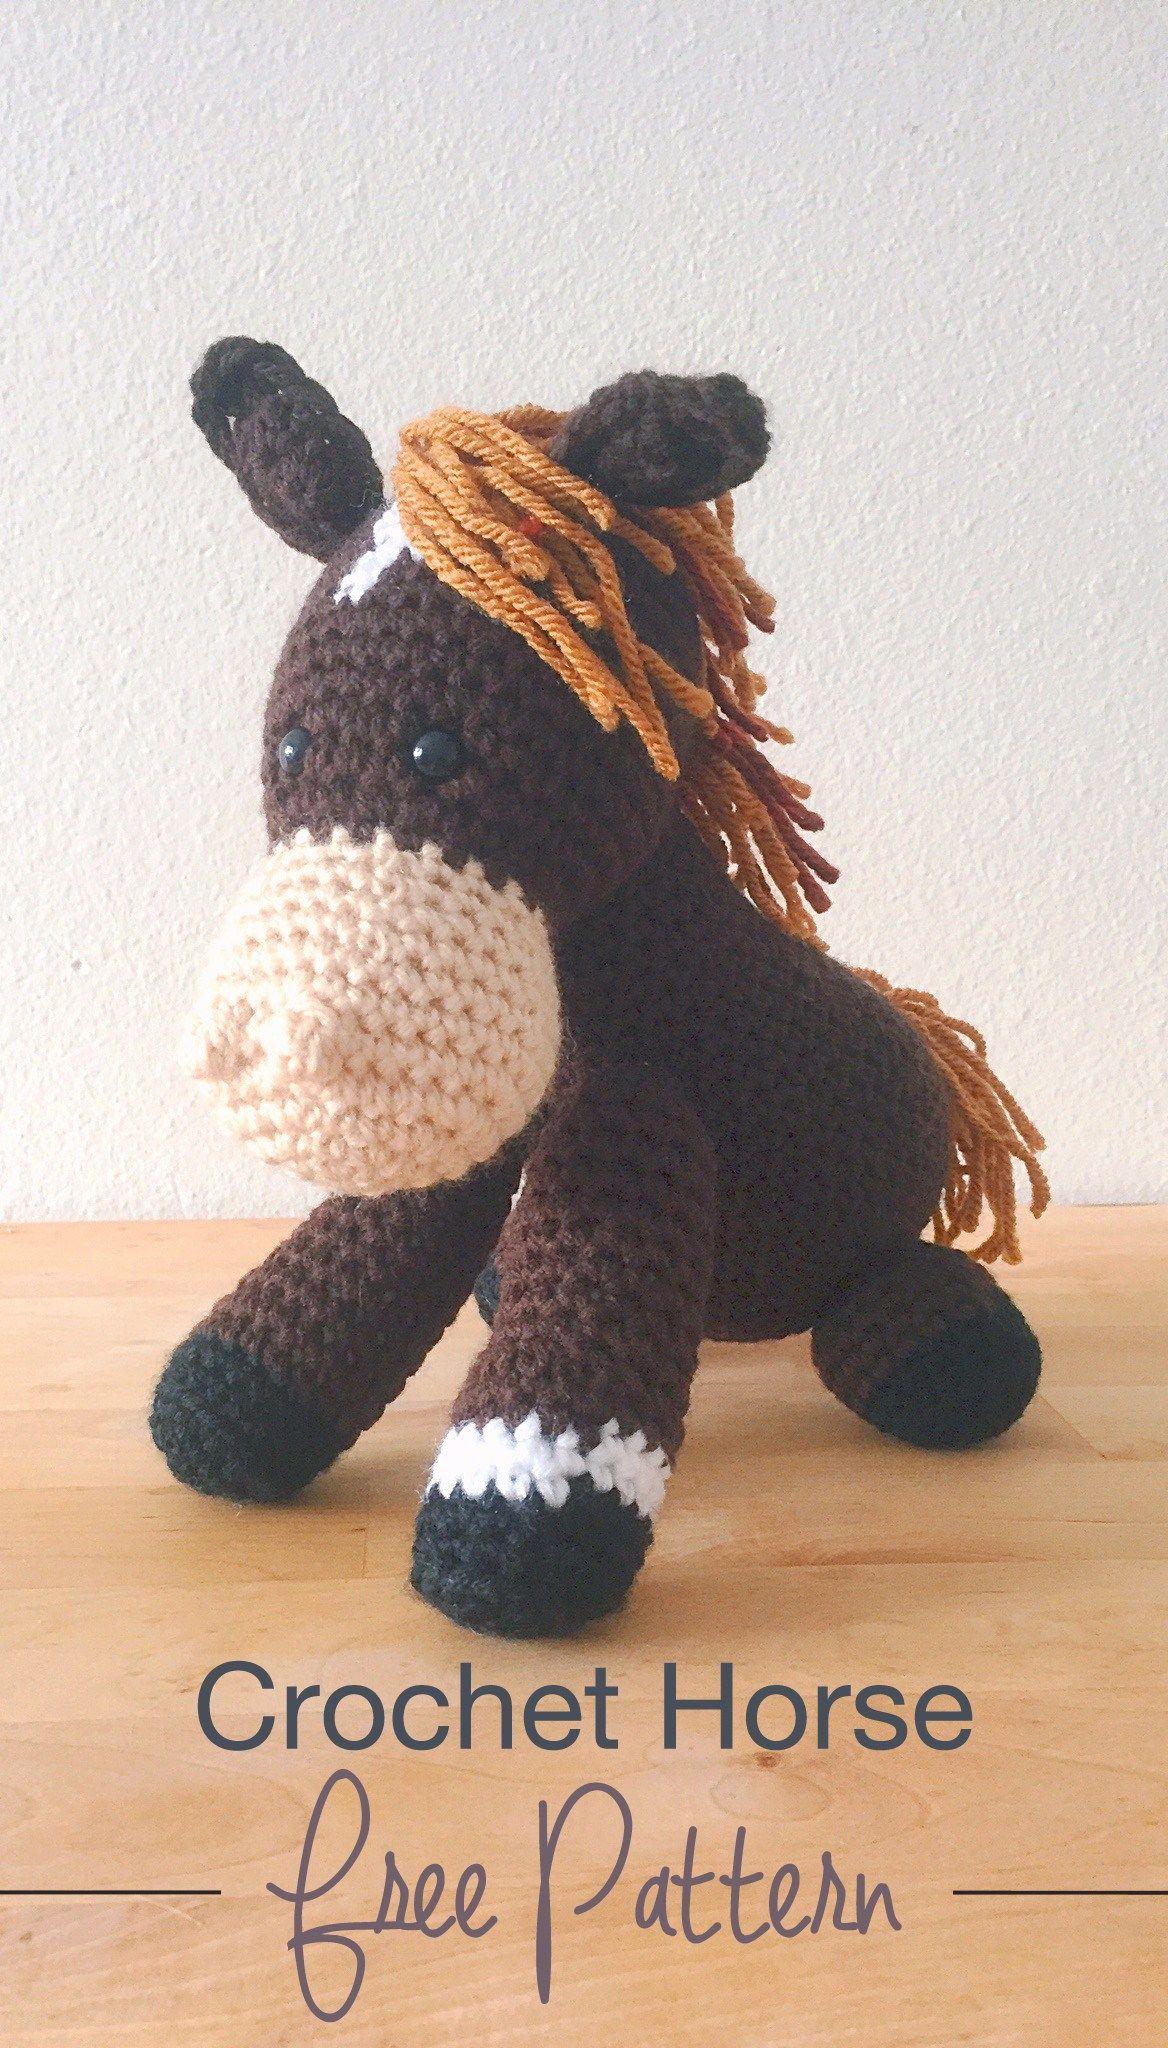 crochet horse pattern | Amigurumi patterns | Pinterest | Crochet ...